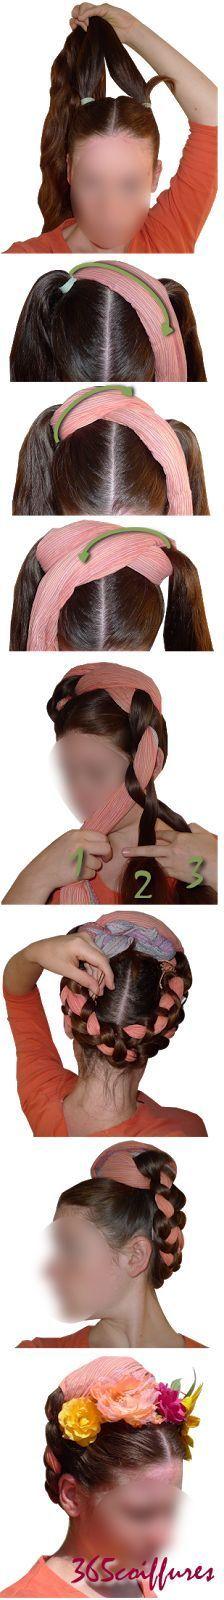 Comment se coiffer avec les tresses de Frida Kahlo. #tuto #DIY #tresse #hairstyle #fridakahlo #braid #trenza #Zöpfe